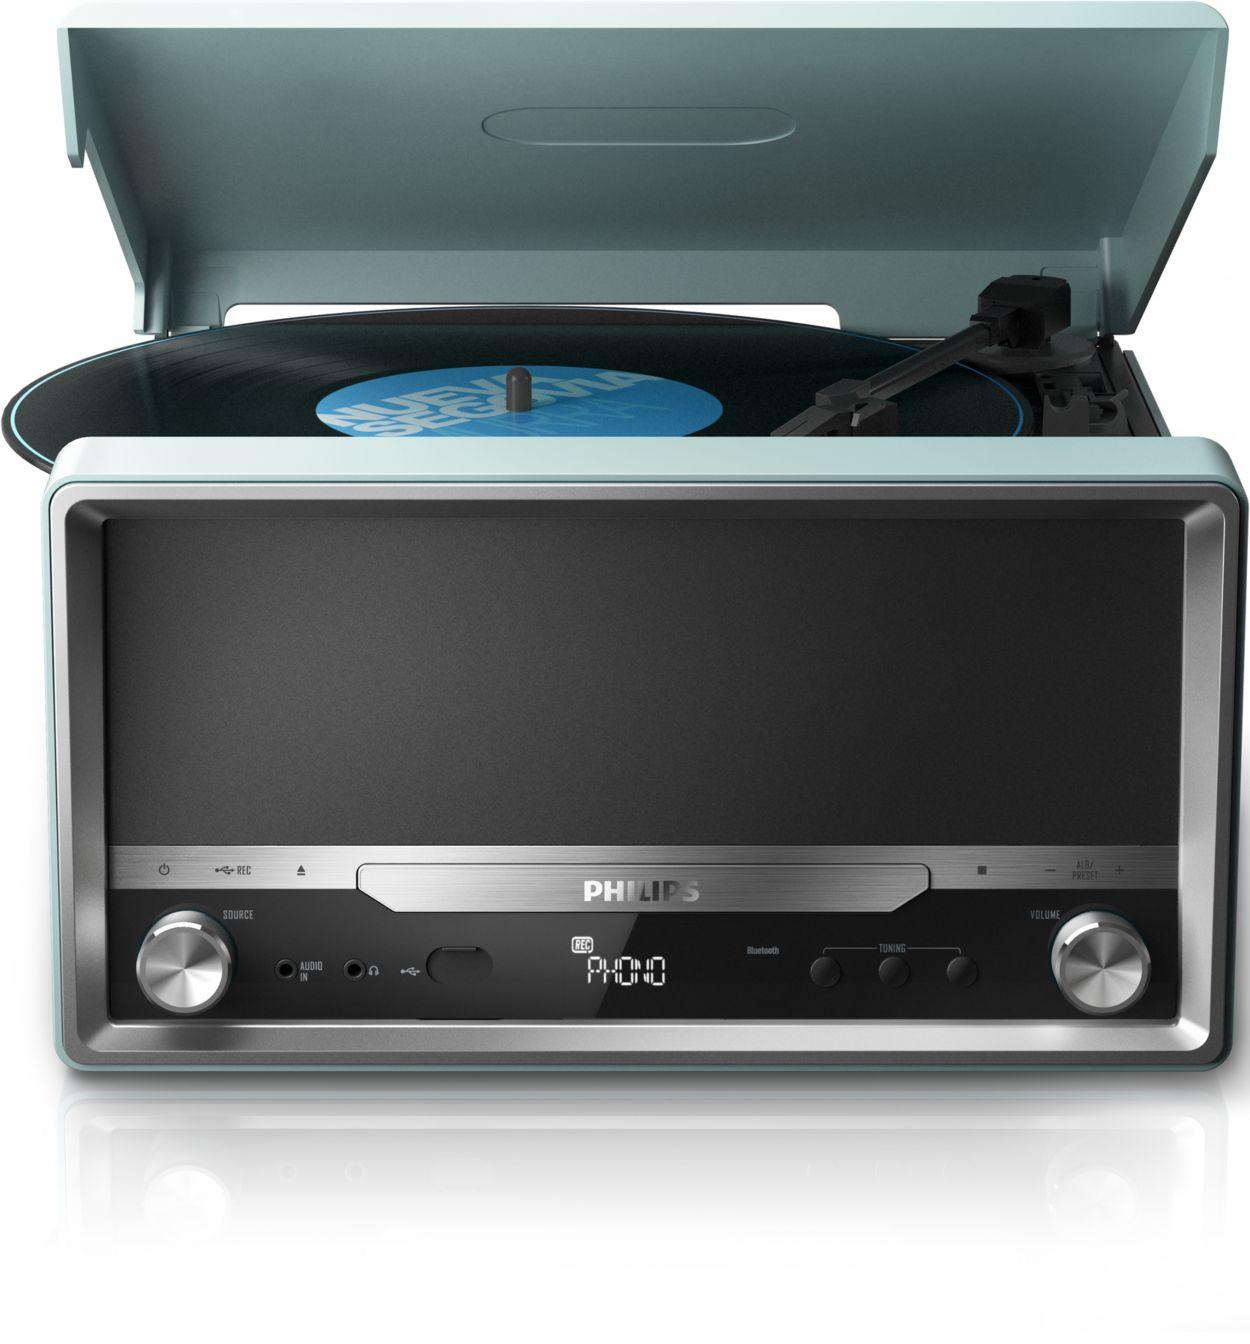 Classic Micro Sound System Ott2000 12 Philips